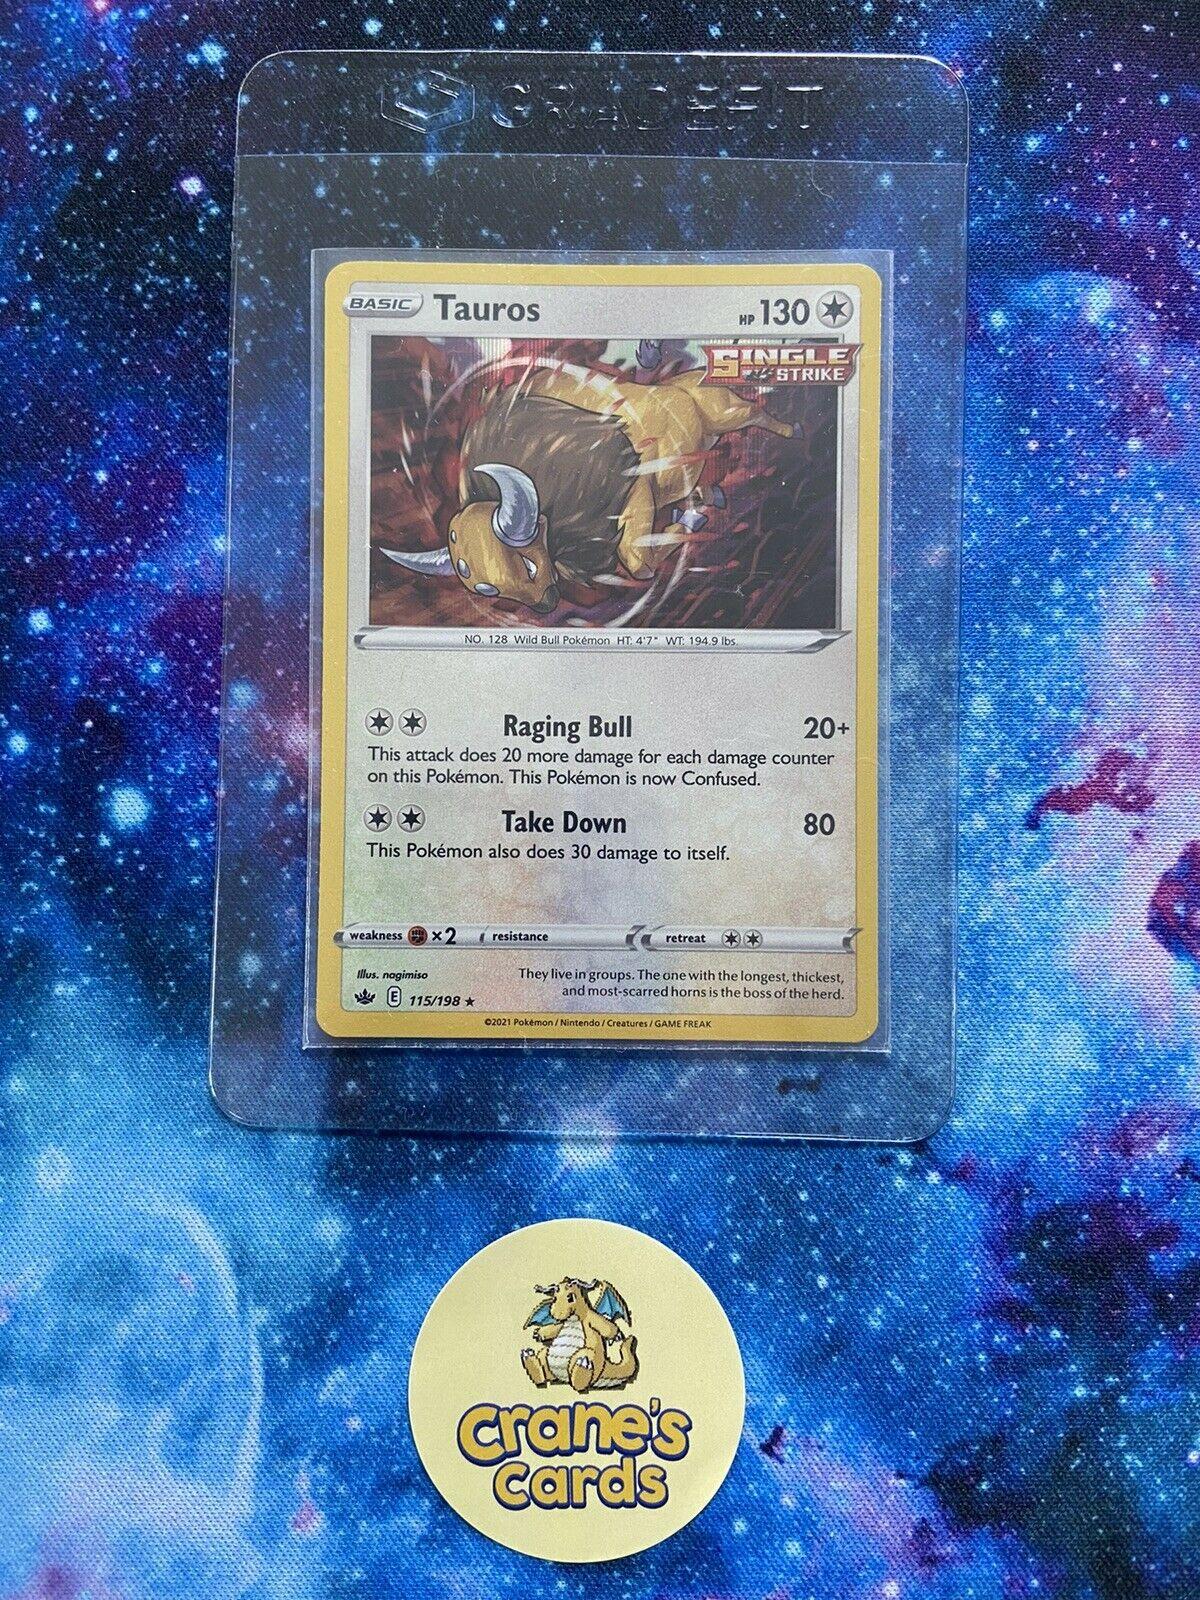 Tauros Holo Rare 115/198 SWSH Chilling Reign Mint Pokemon Card - Image 3